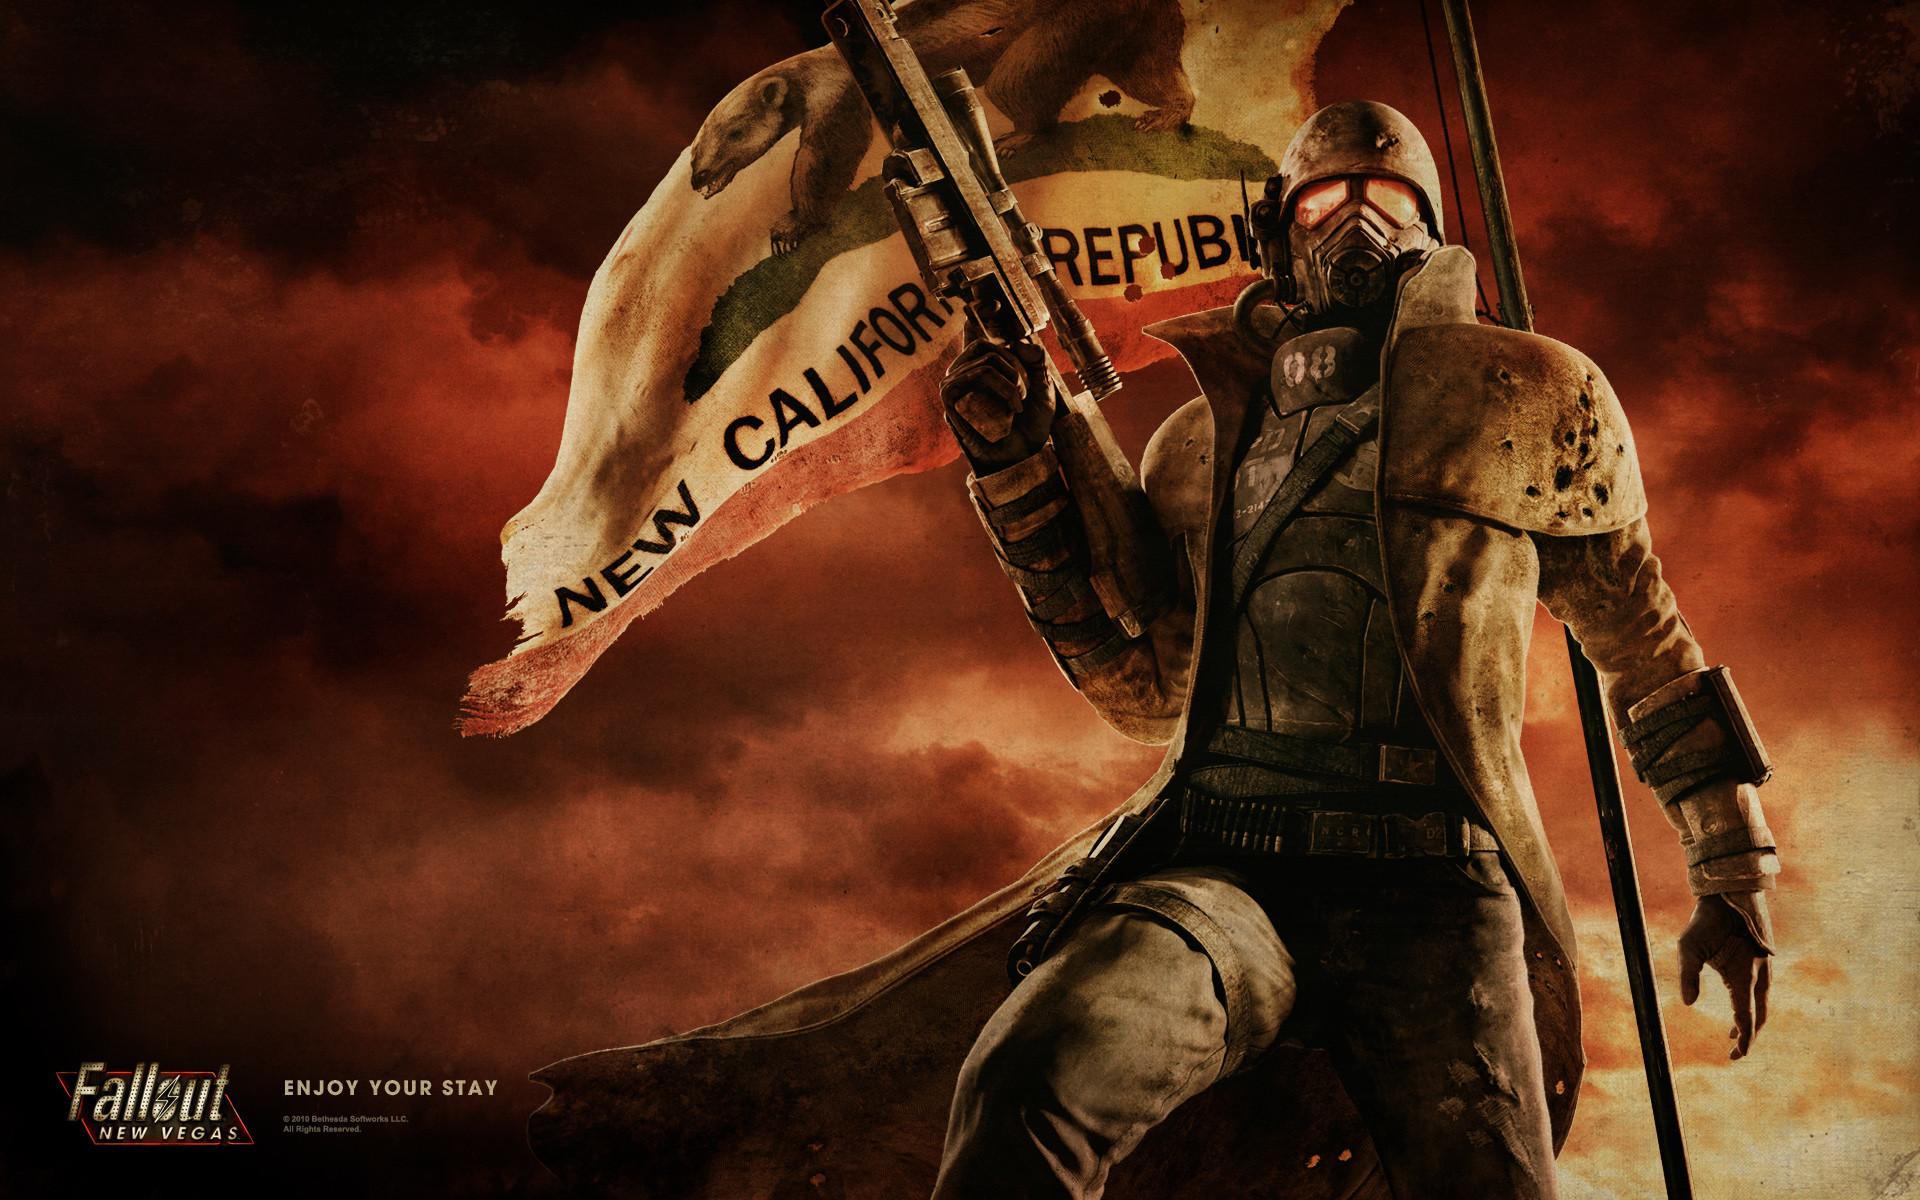 Fallout New Vegas Wallaper 3 – Fallout4 : New vegas Wallpaper .